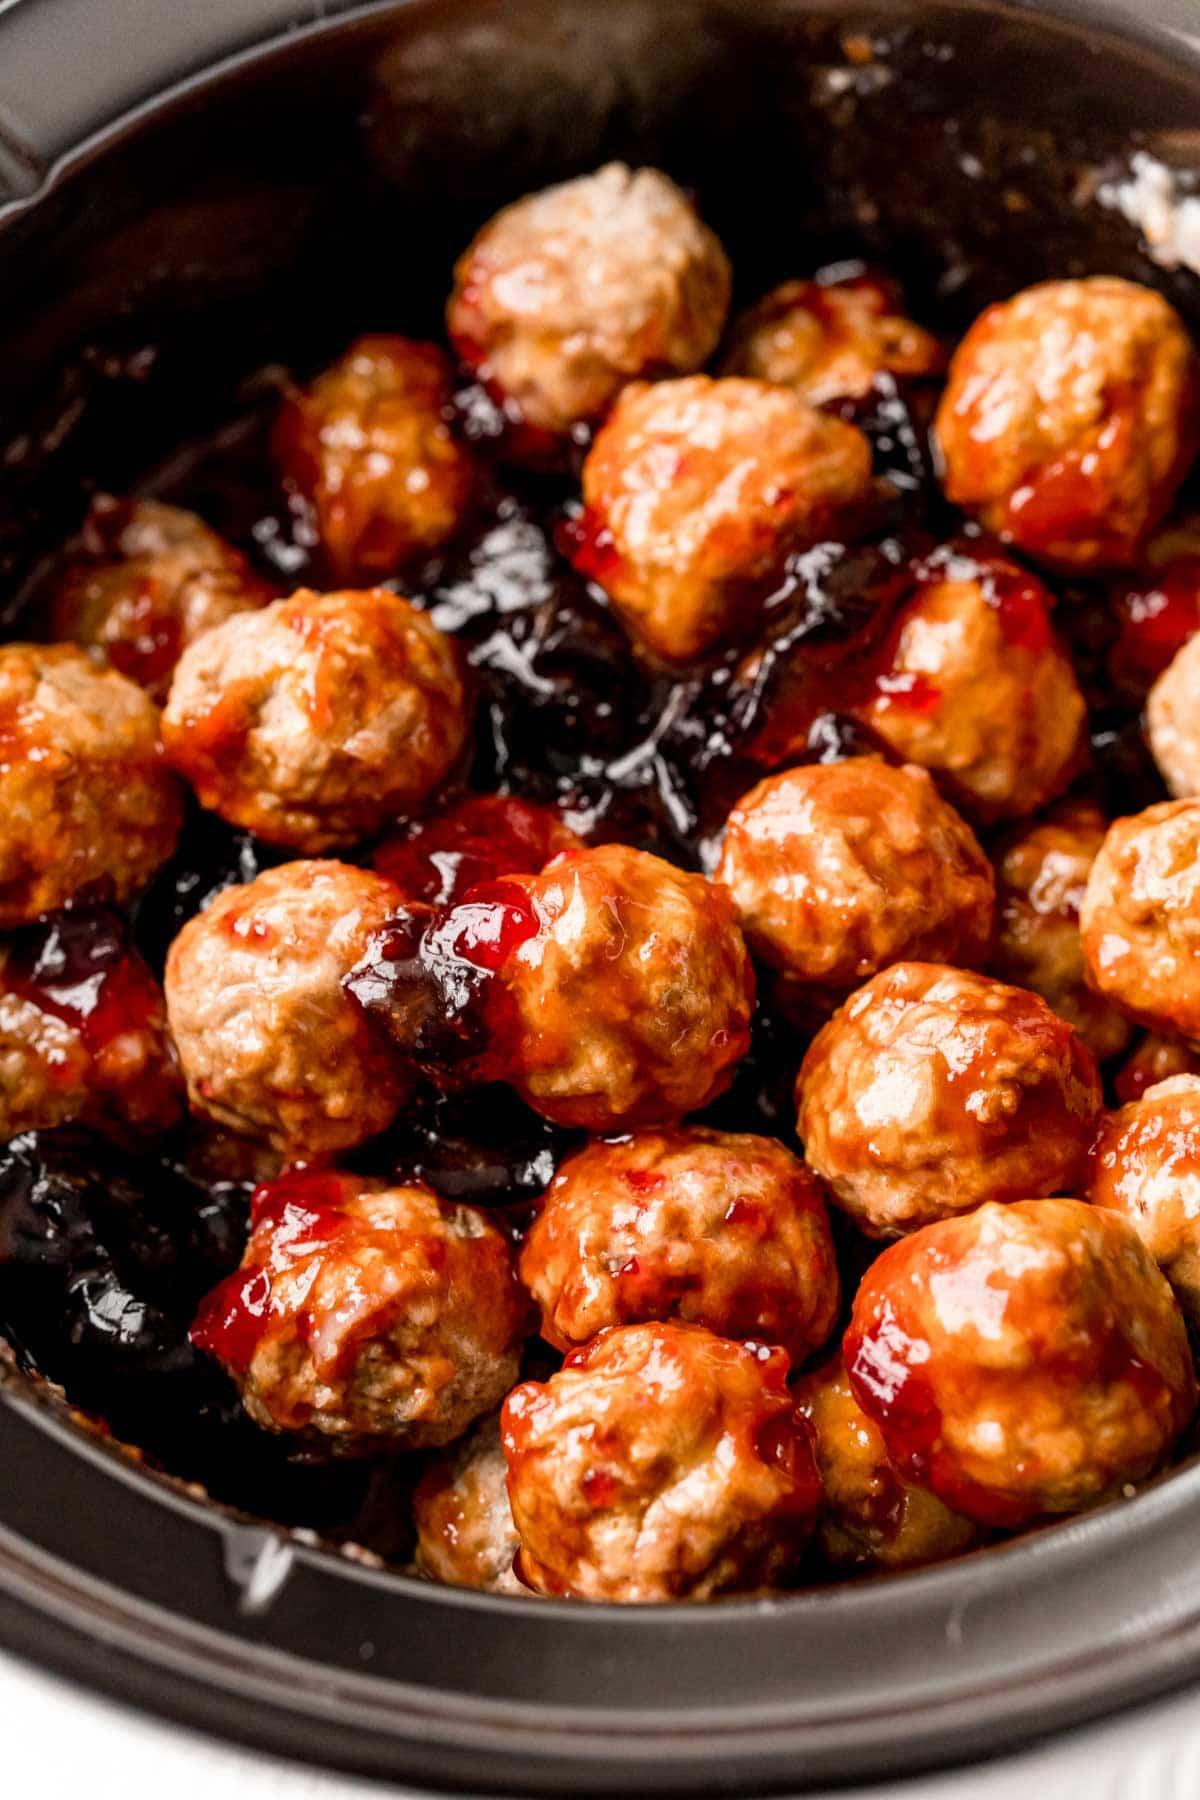 Grape jelly meatballs in a crockpot